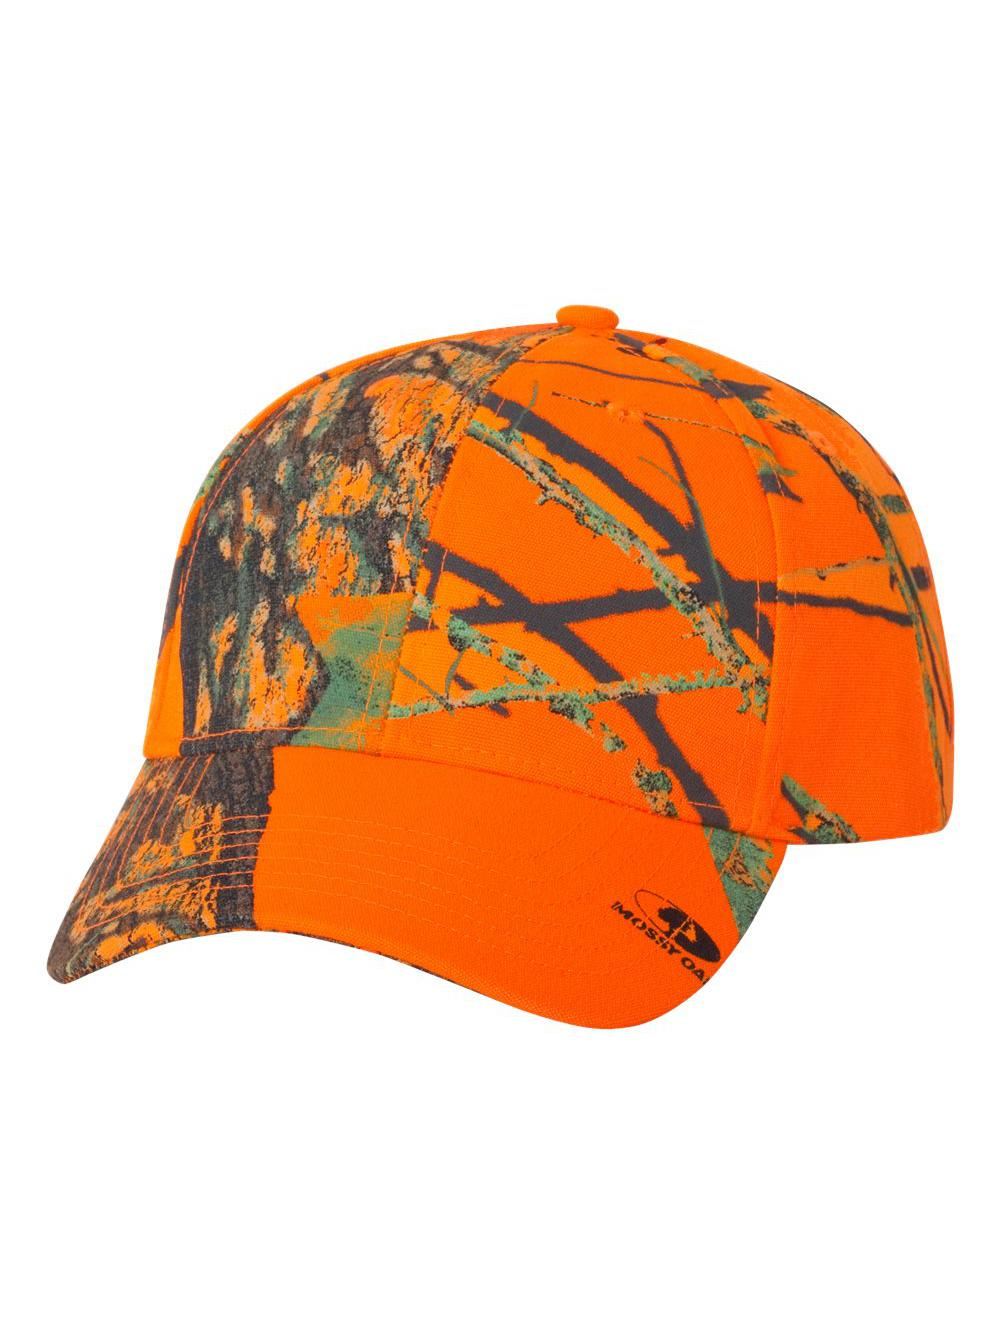 aad60315fadcb Kati Sn200 Structured Camo Cap Mossy Oak Break-up Blaze Orange